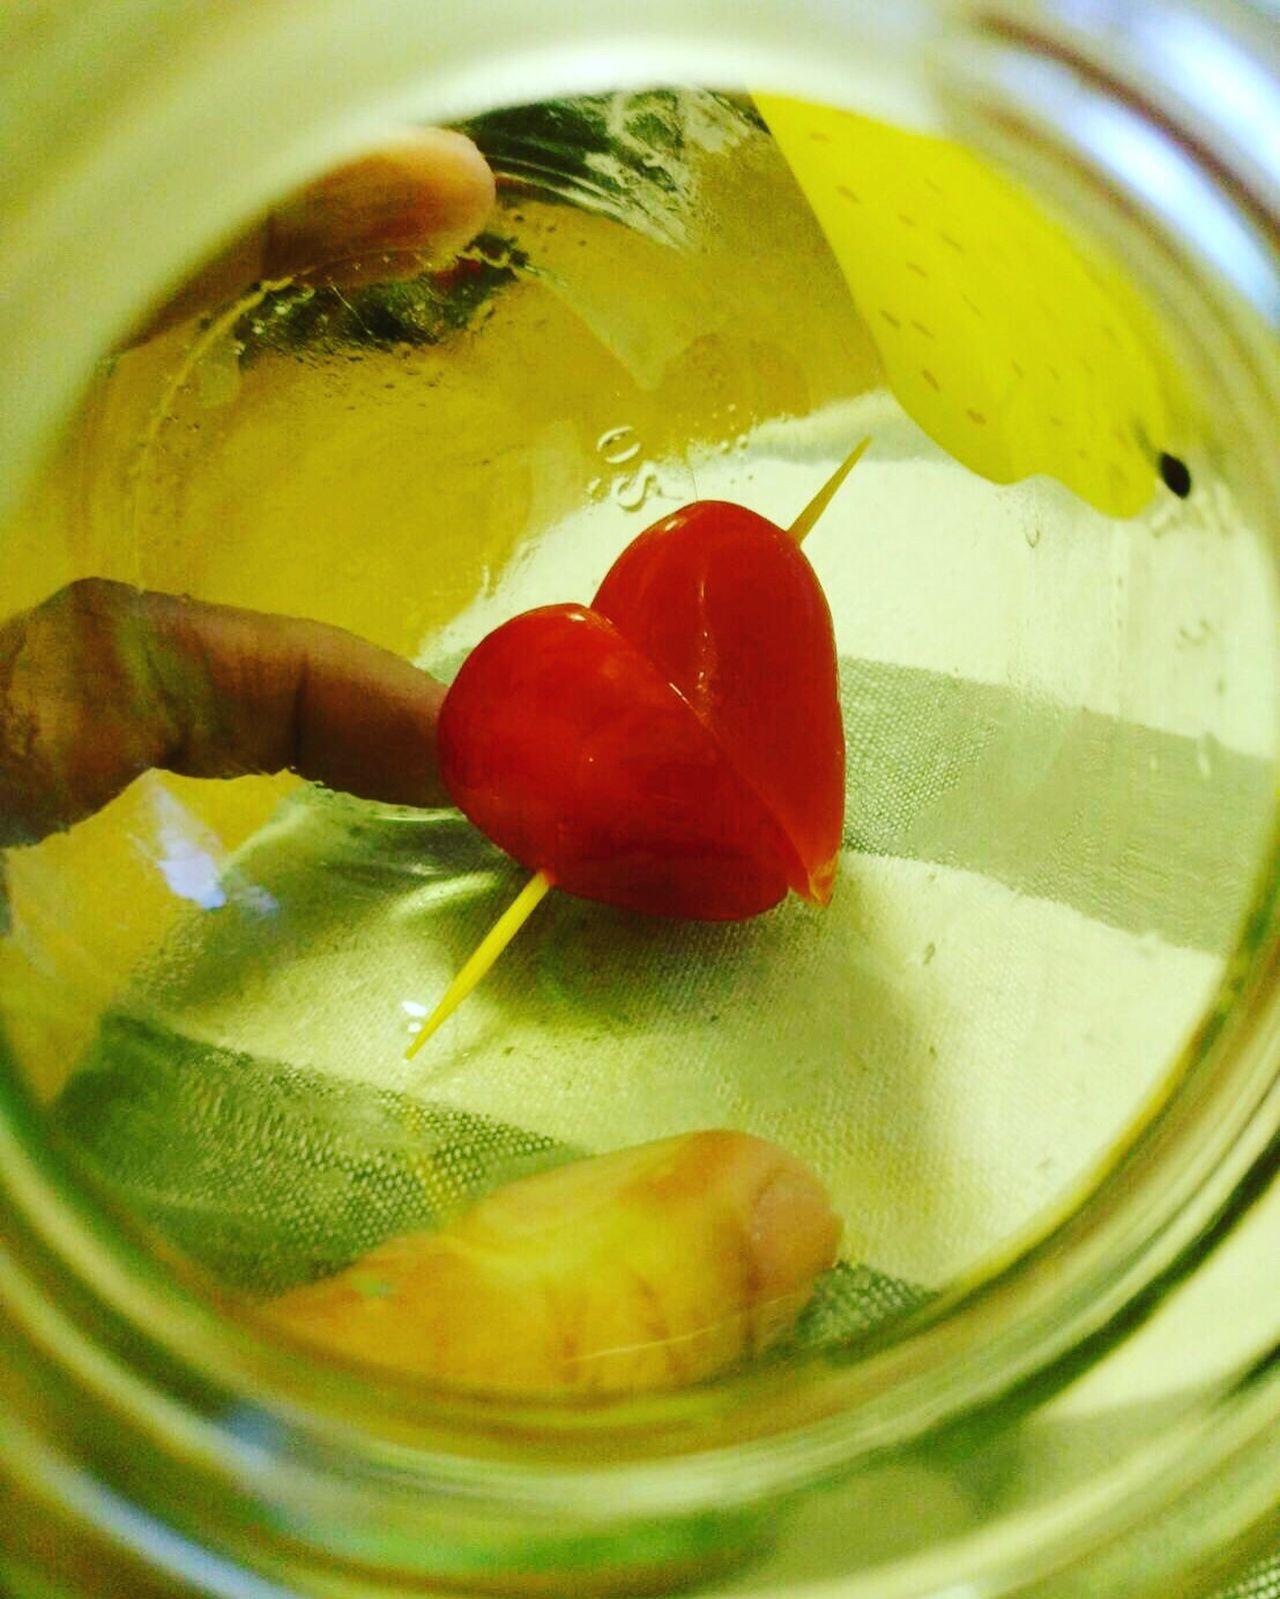 Heart Valentine's Day  Little Jars  Lovely Happiness Tomato Feeling